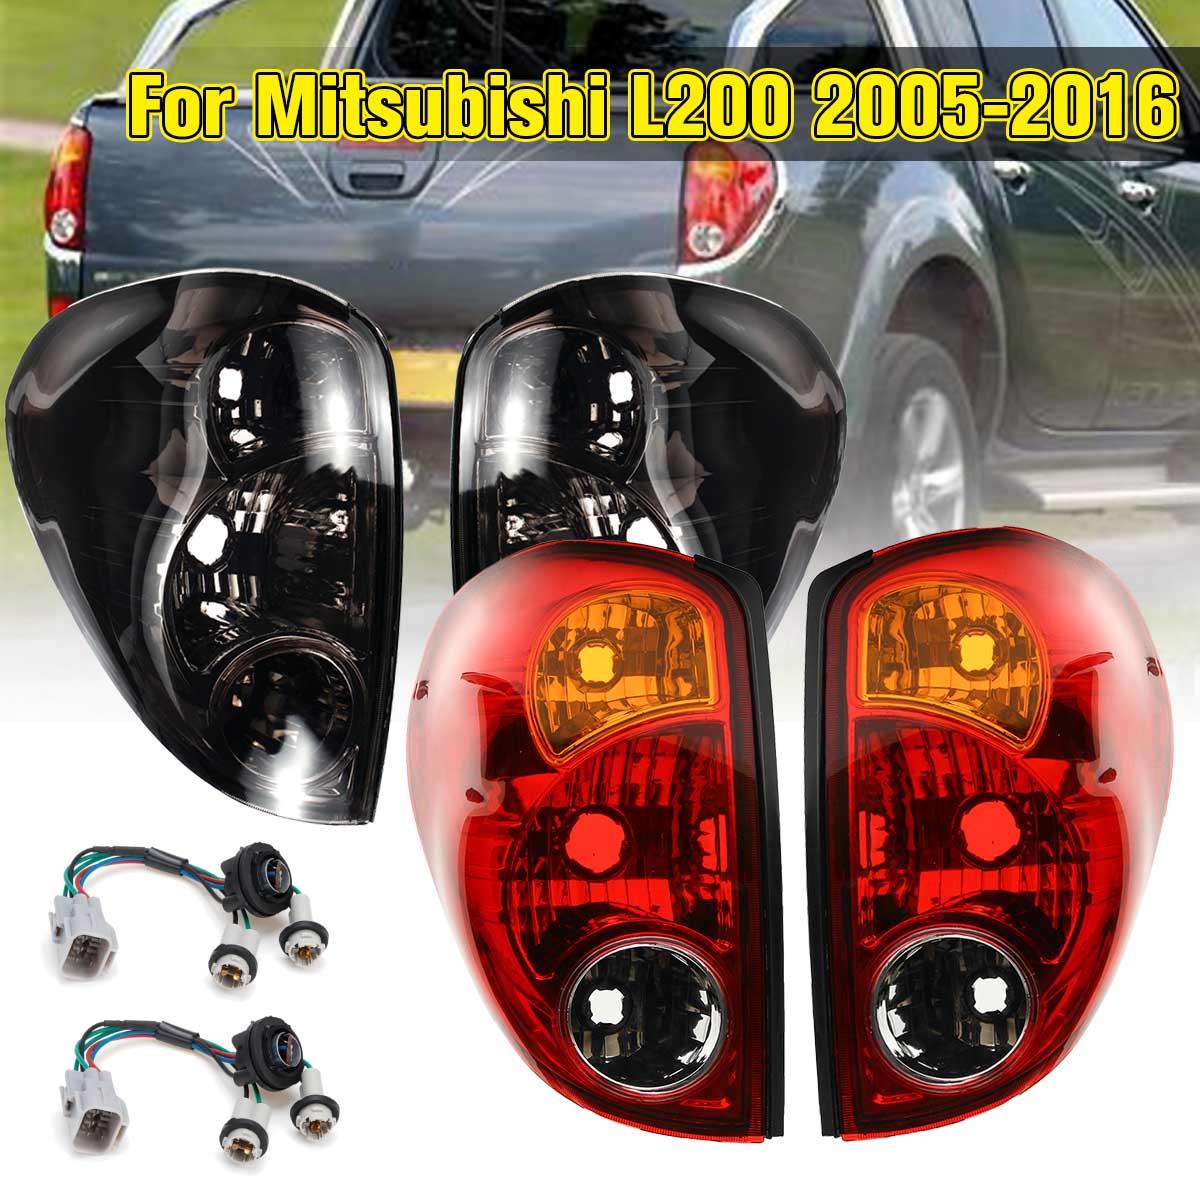 Left Side Rear Tail Light Lamp Fit For Mitsubishi L200 Triton Pickup 2005-2016